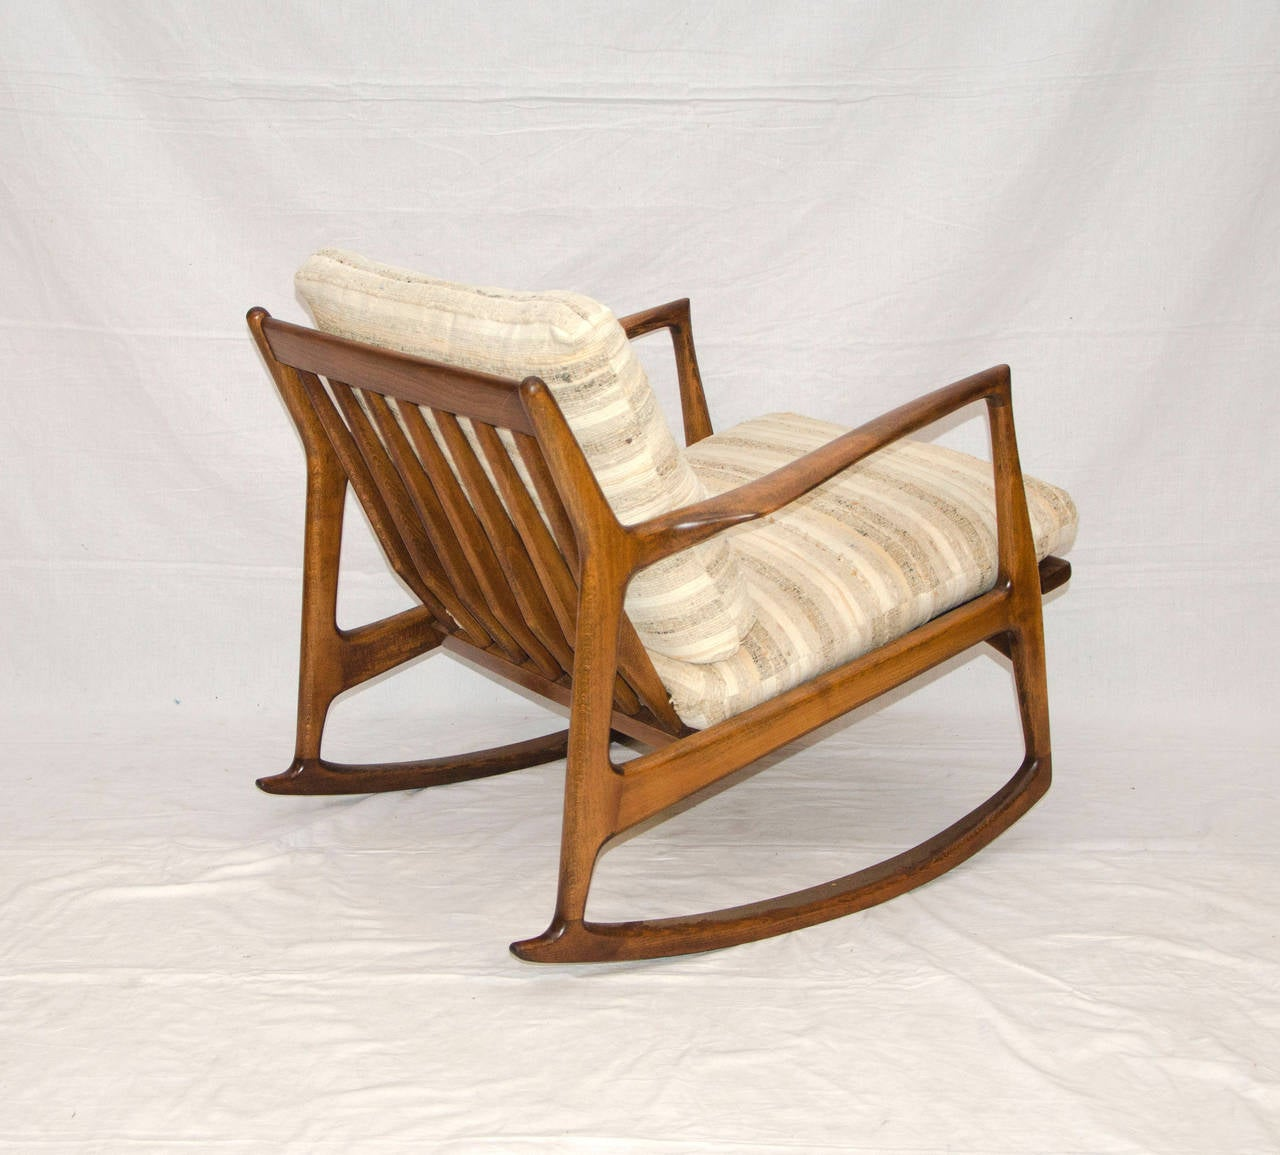 Danish Rocking Chair Chairs amp Seating